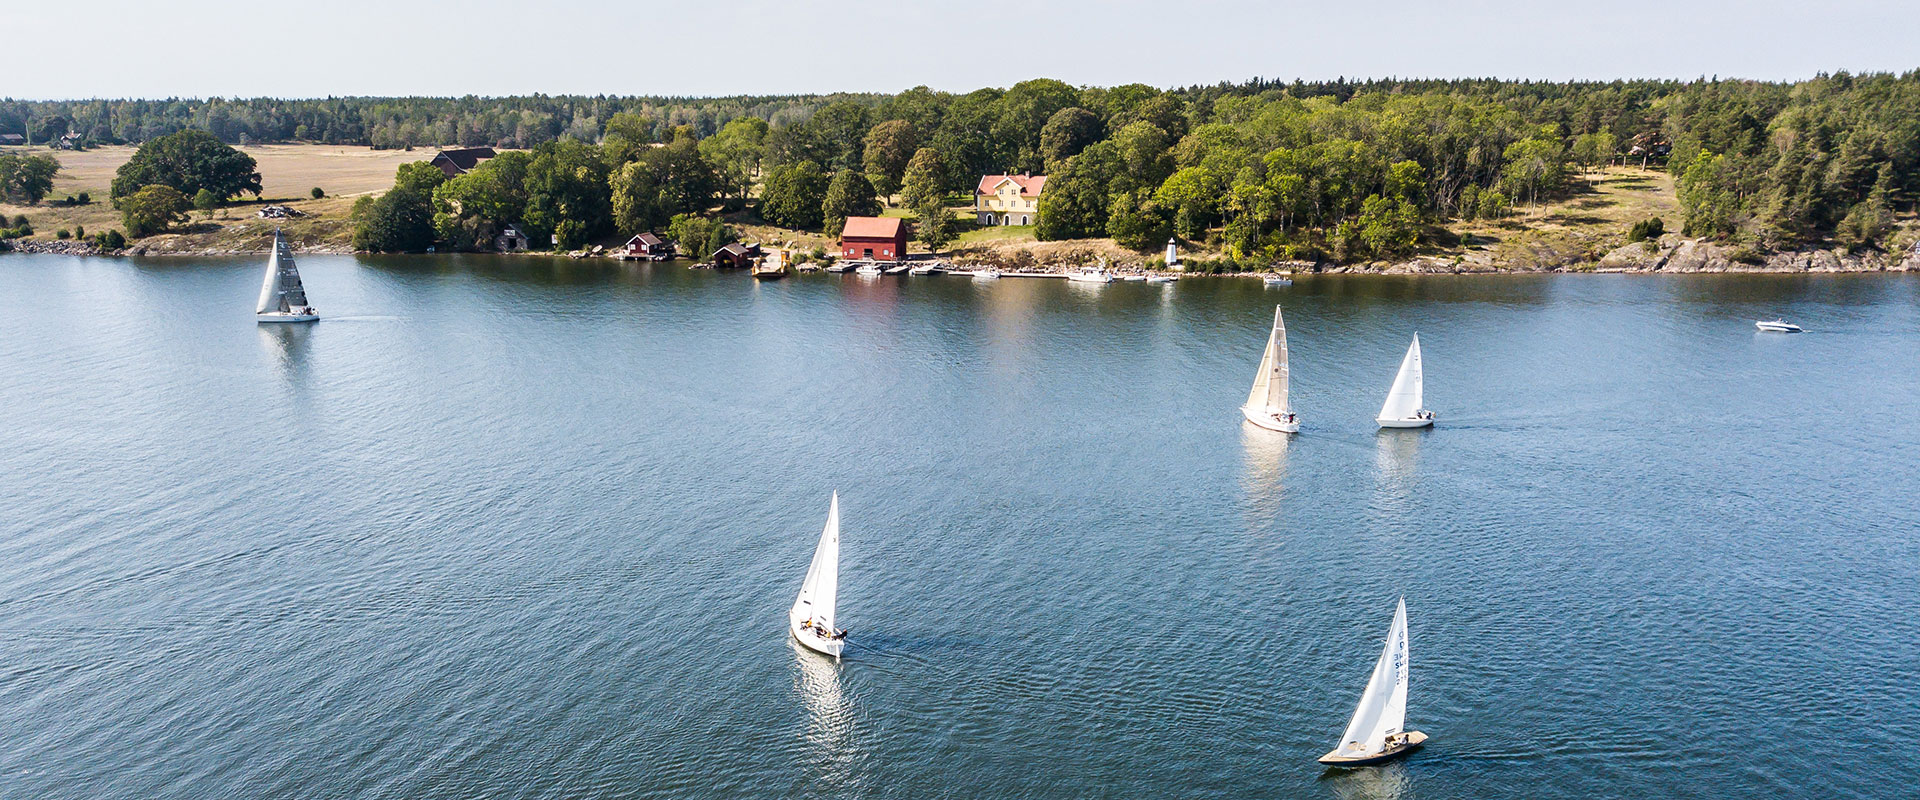 brommösund-segelbåtar